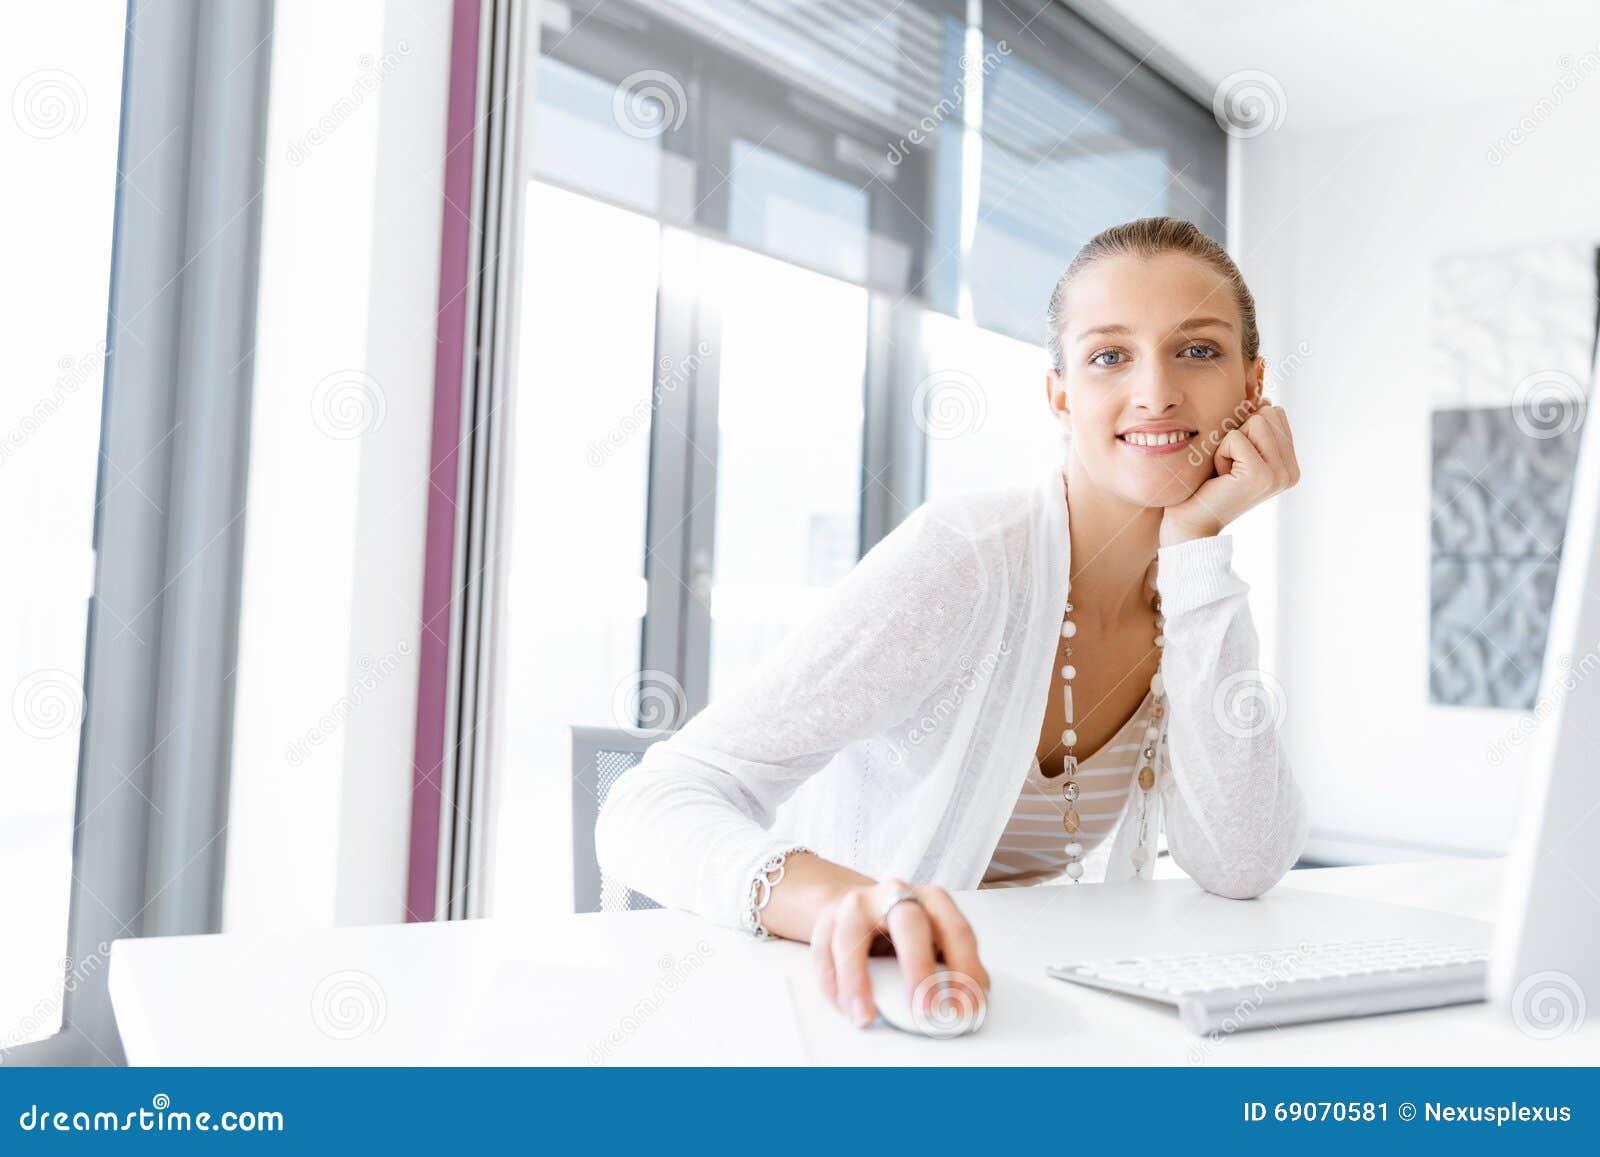 employ de bureau attirant s 39 asseyant au bureau photo stock image 69070581. Black Bedroom Furniture Sets. Home Design Ideas